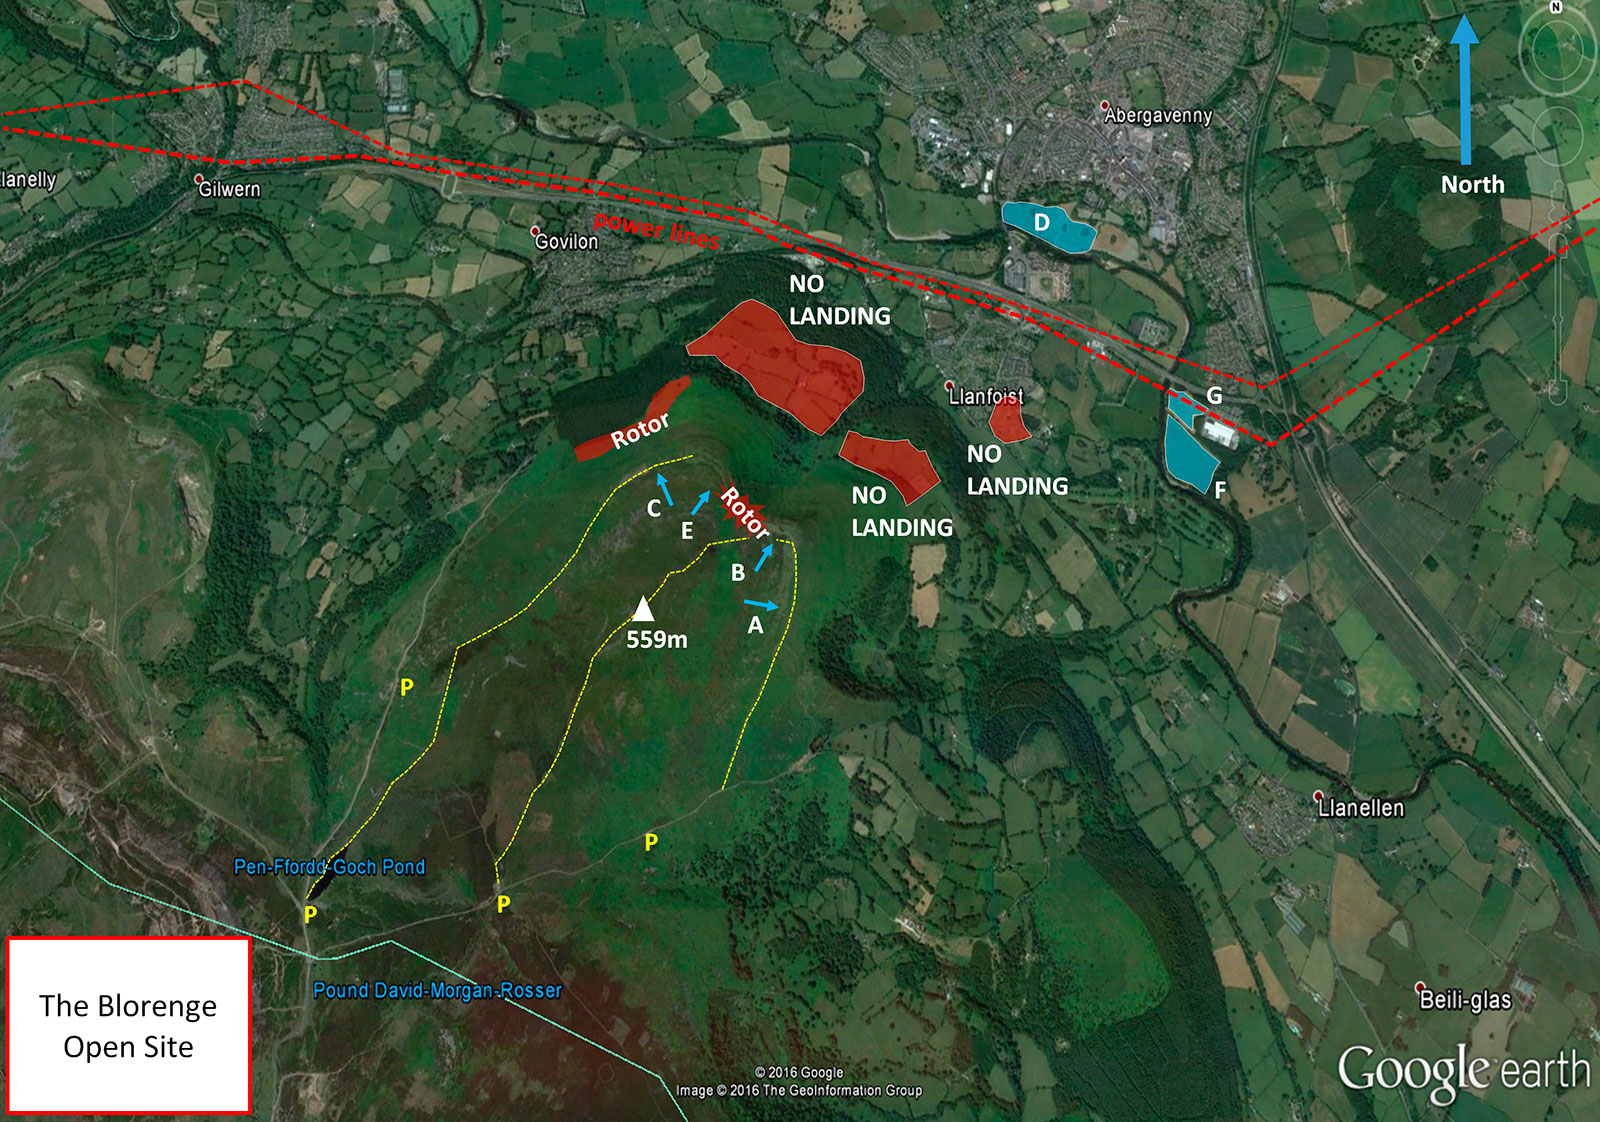 blorenge-site-image-map